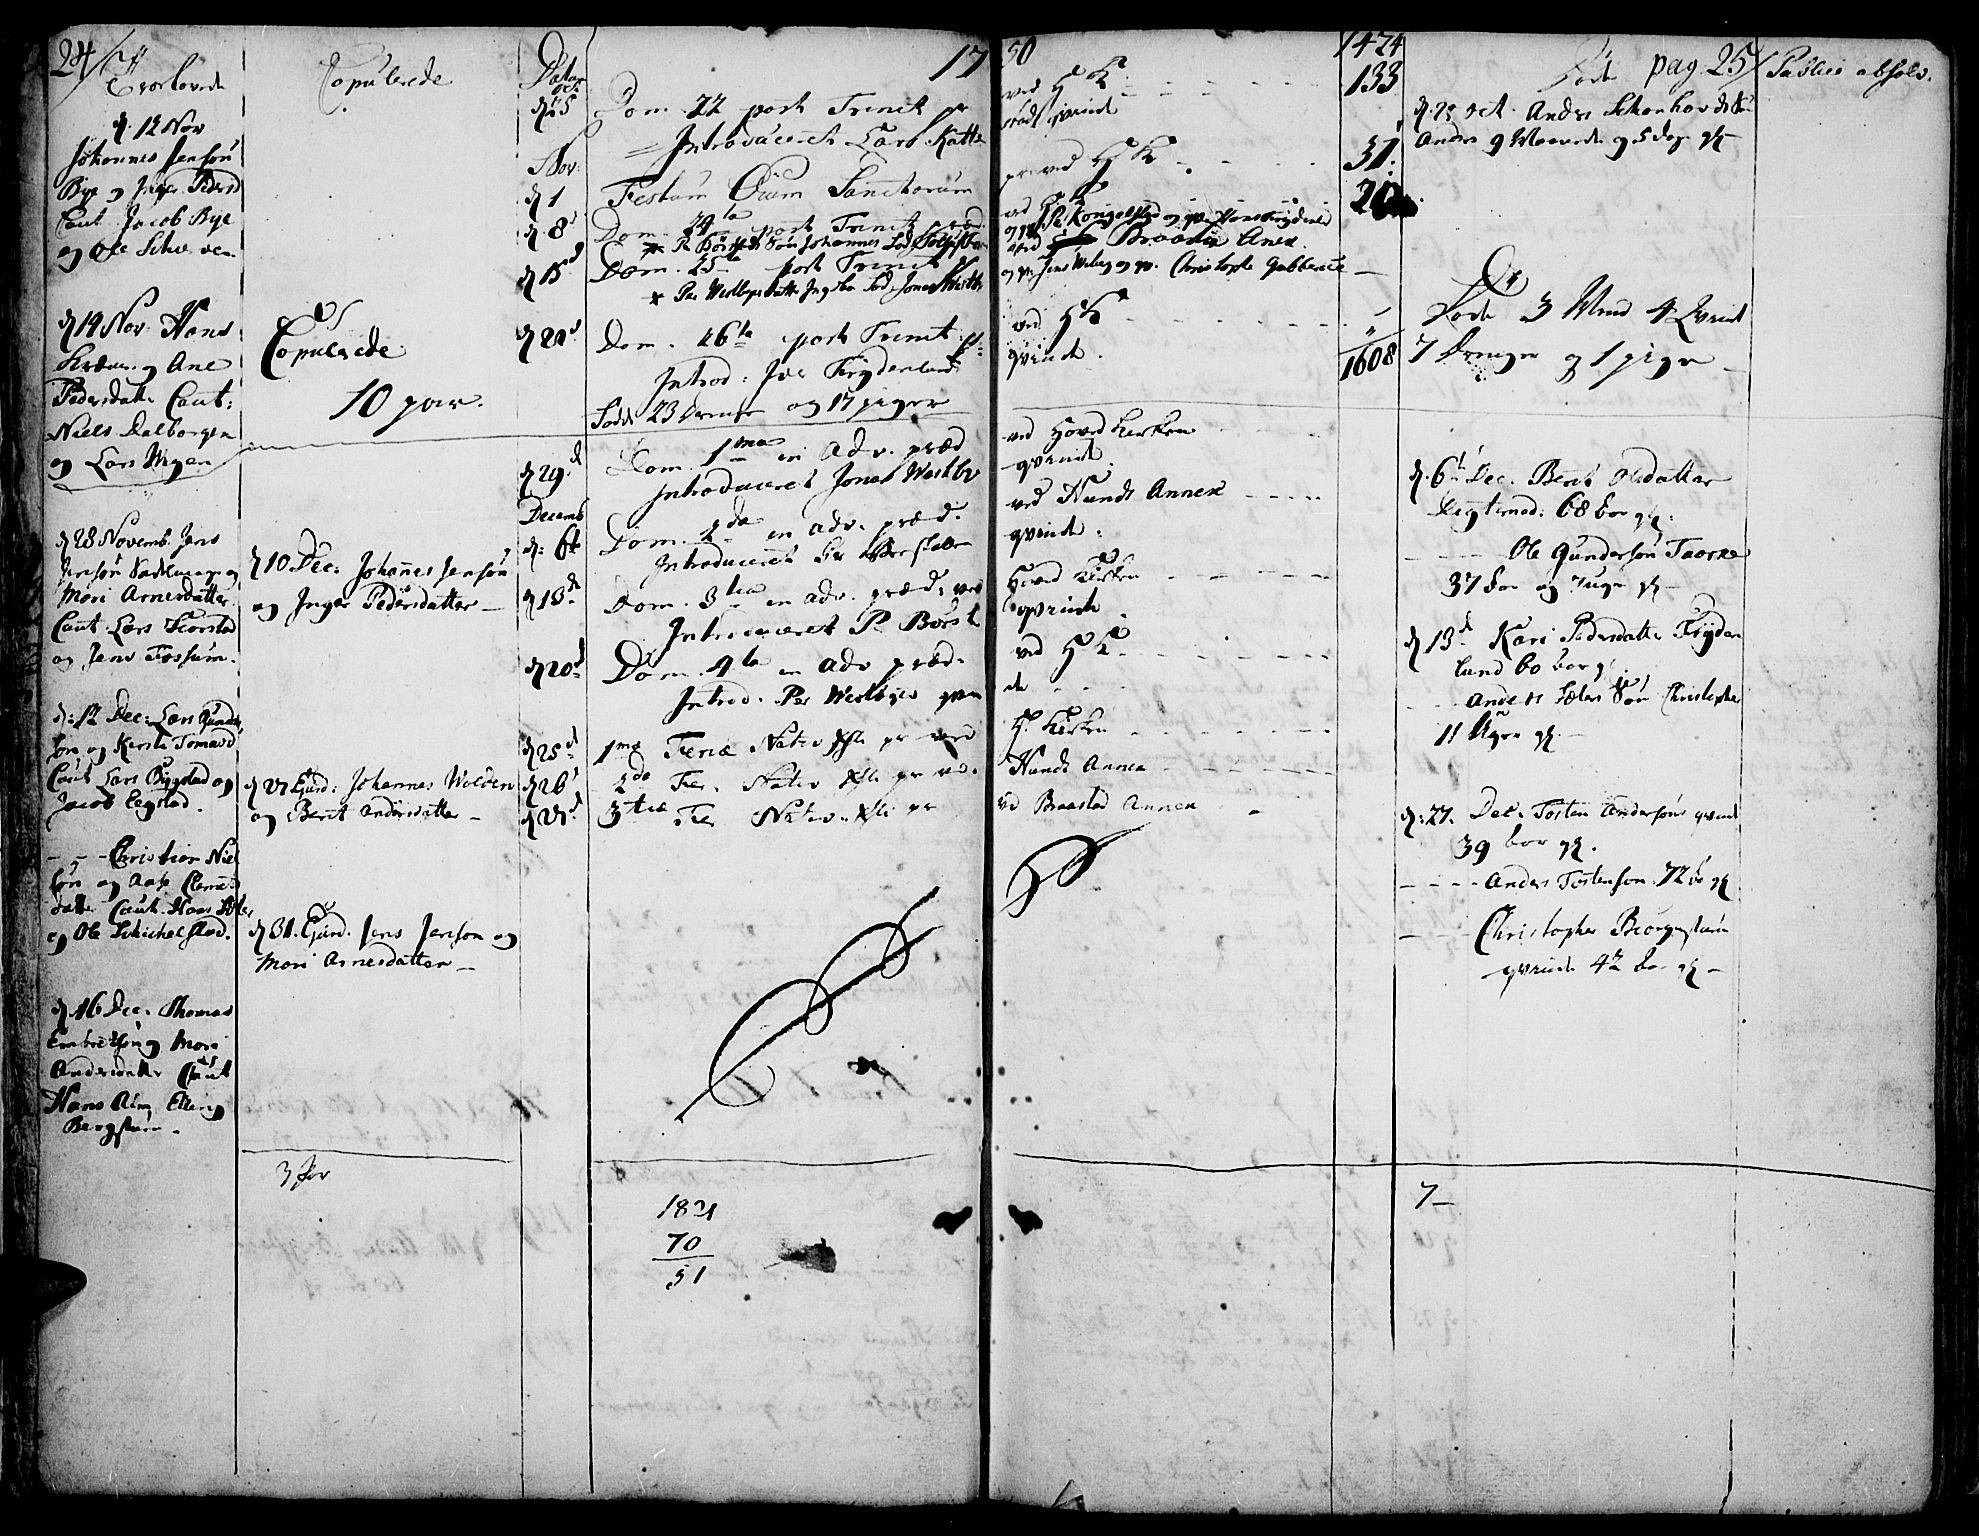 SAH, Vardal prestekontor, H/Ha/Haa/L0002: Ministerialbok nr. 2, 1748-1776, s. 24-25